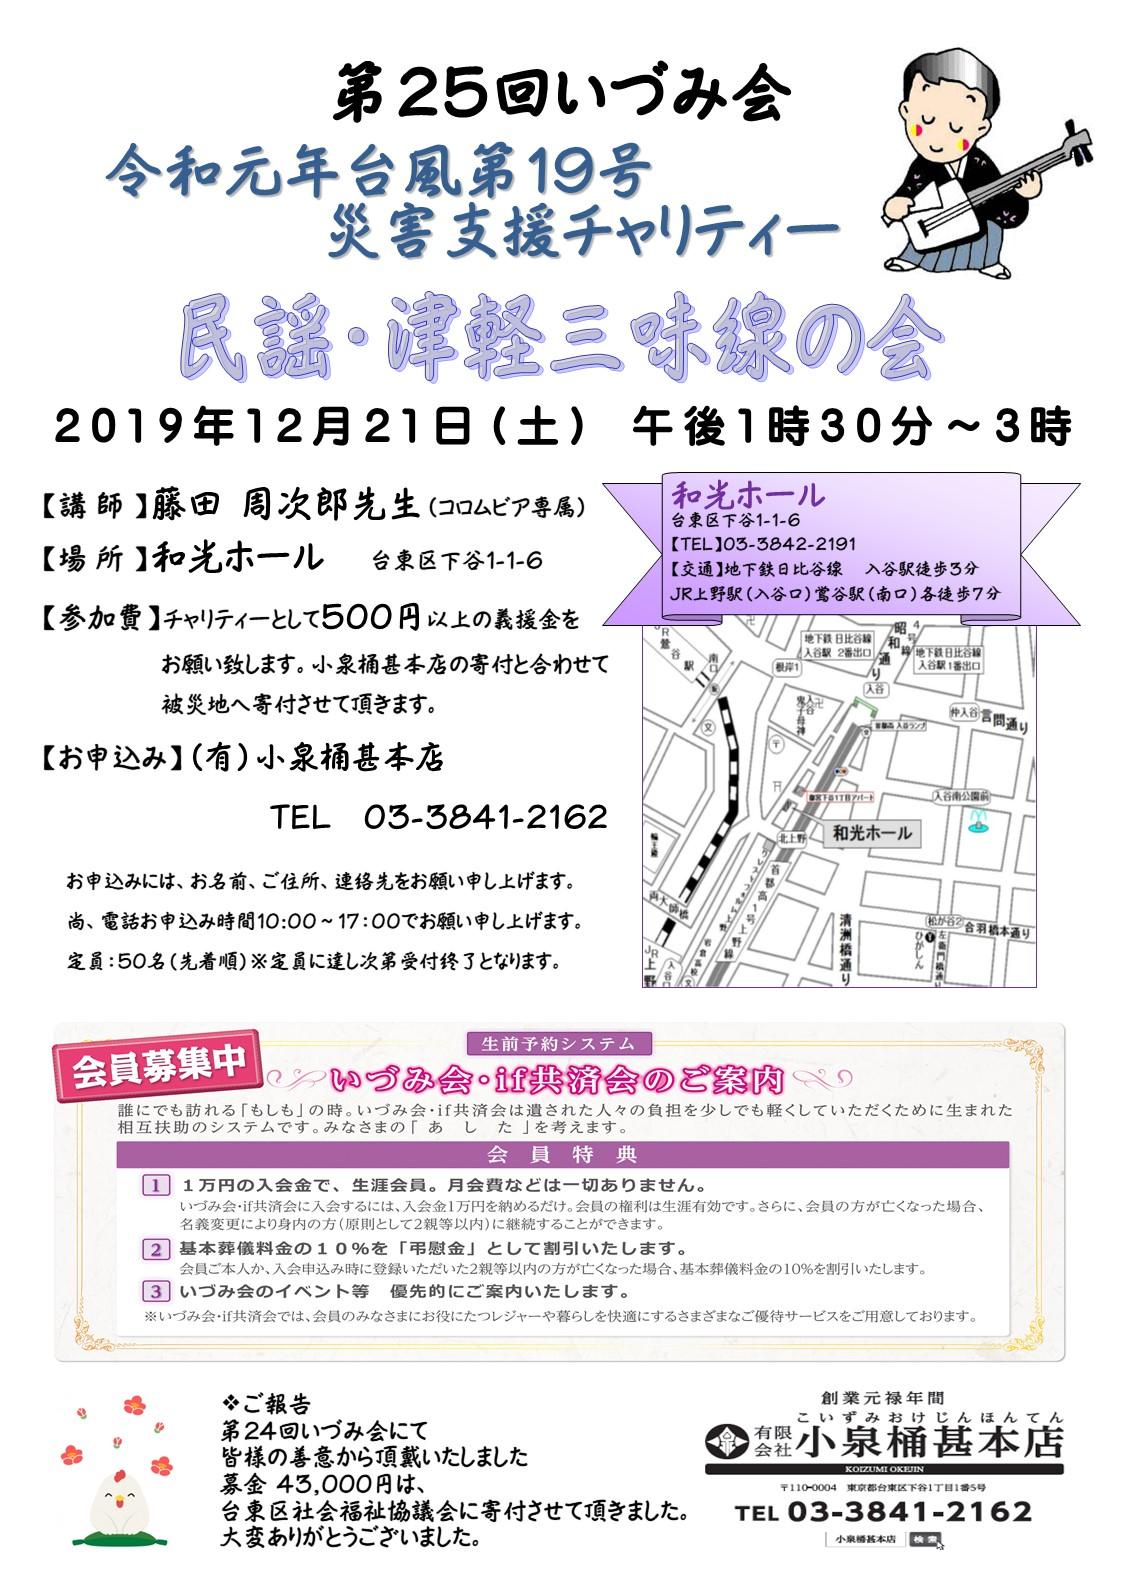 https://koizumiokejin.com/wp/wp-content/uploads/2019/11/25回いづみ会ポスター.jpg